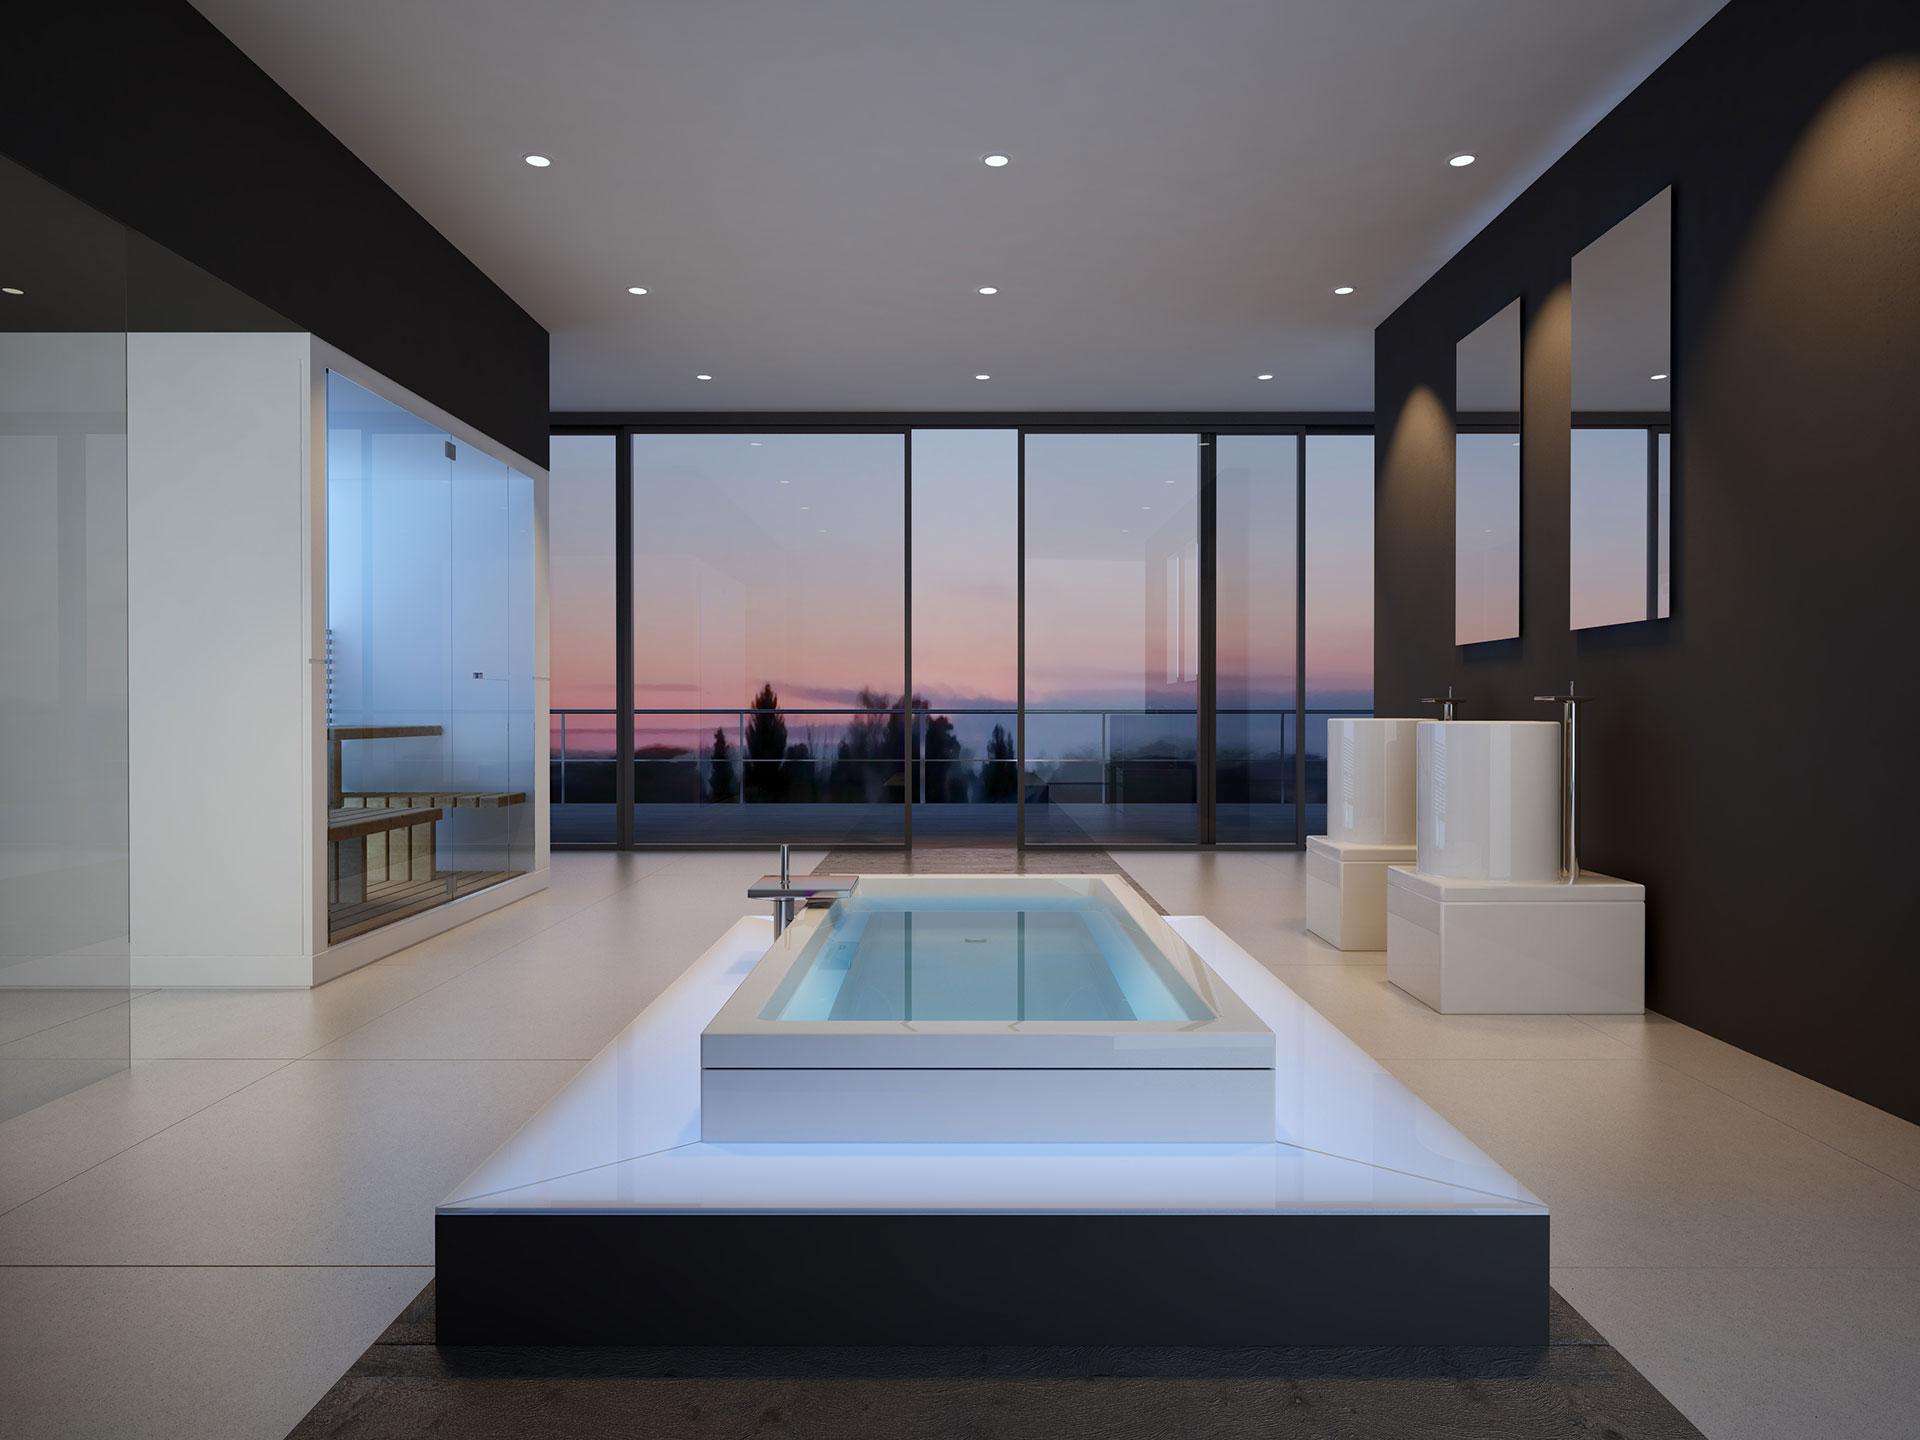 leistungen fliesen glonegger. Black Bedroom Furniture Sets. Home Design Ideas